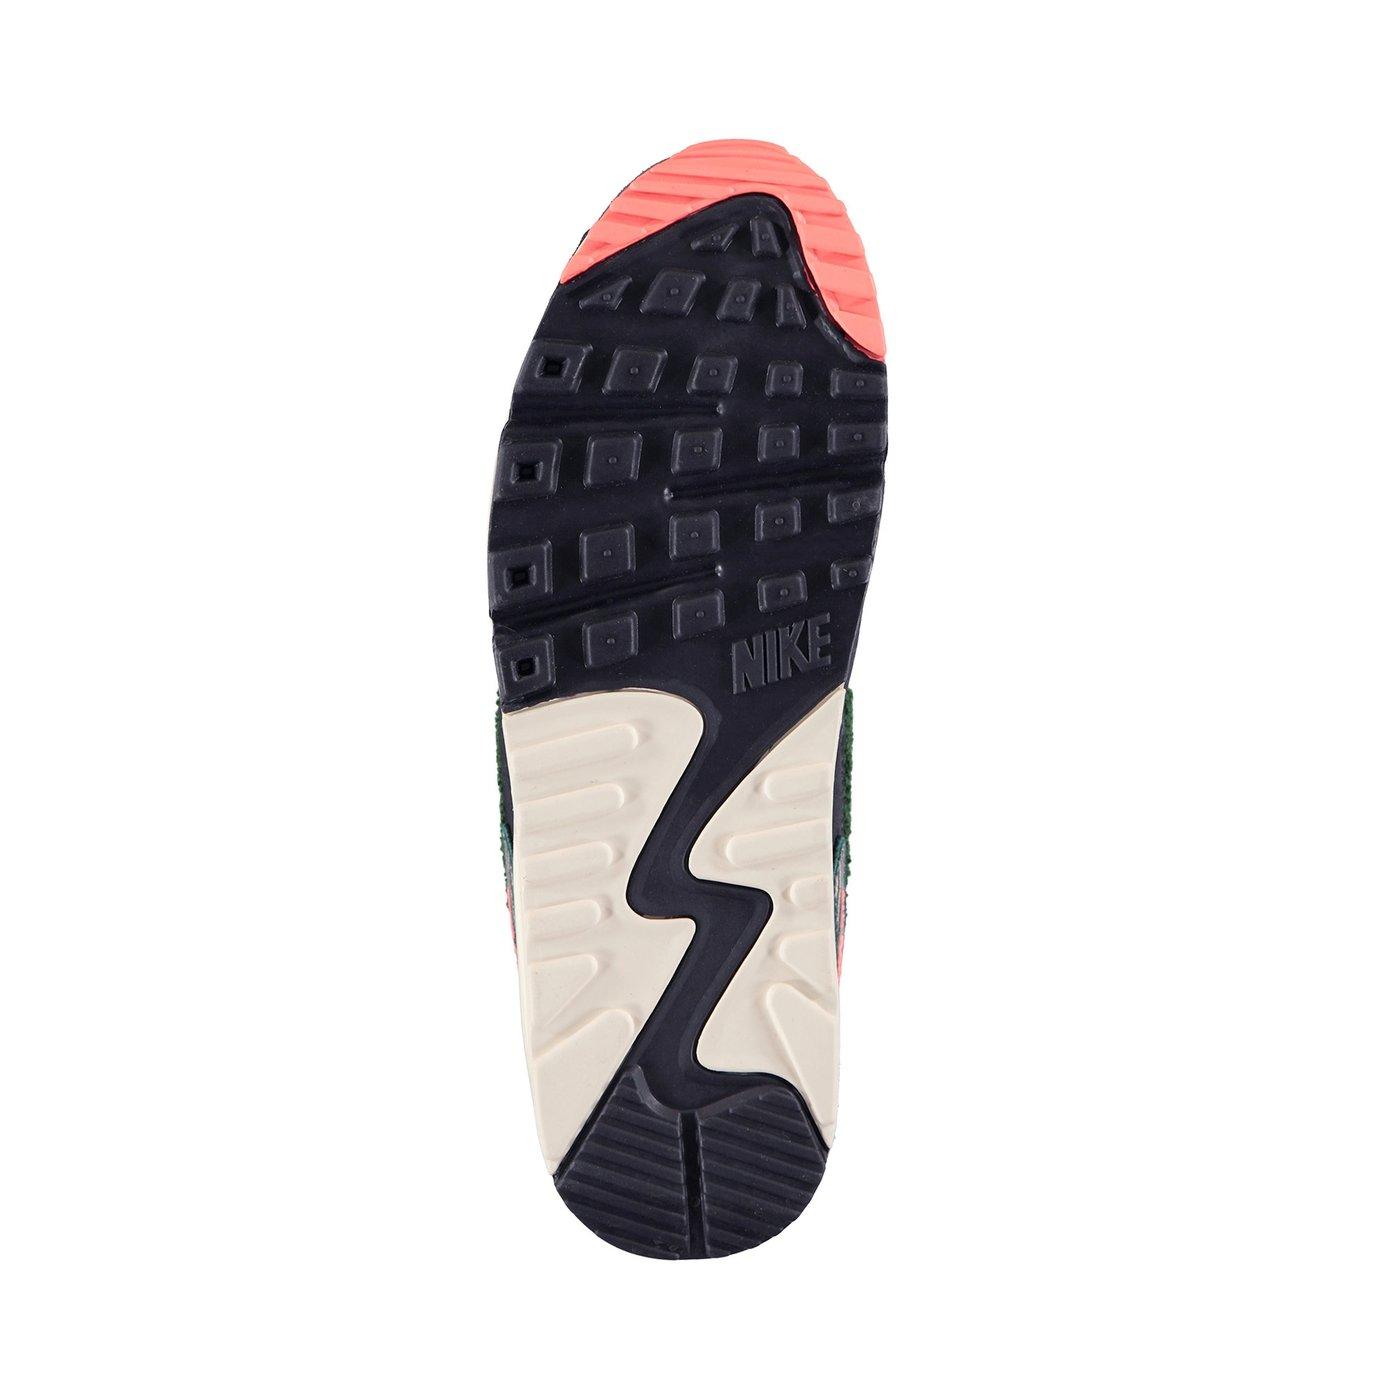 Nike Air Max 90 Premium Erkek Gri Spor Ayakkabı